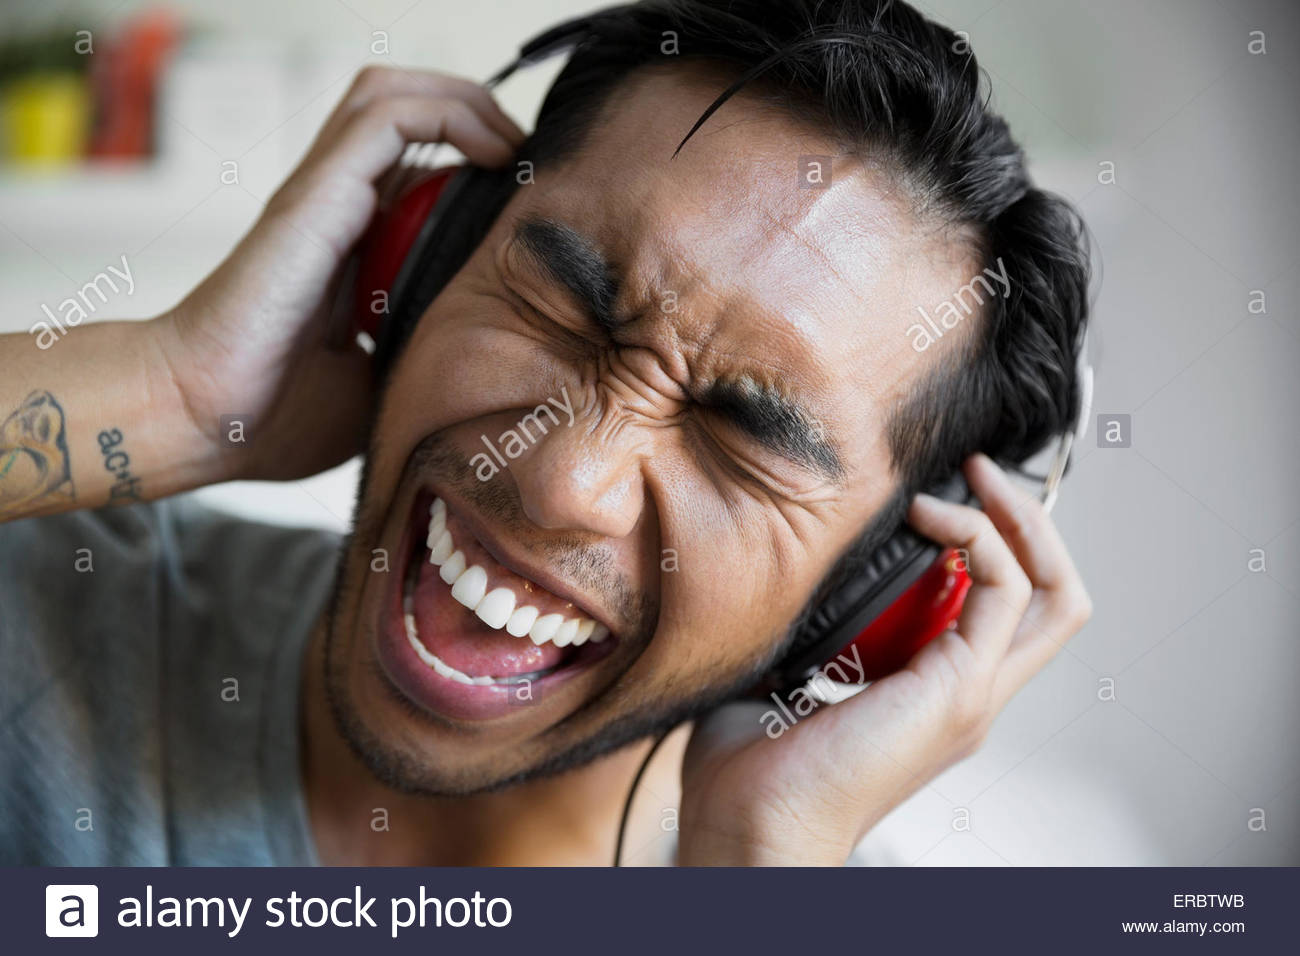 Begeisterte Menschen hören singen Musik über Kopfhörer Stockbild